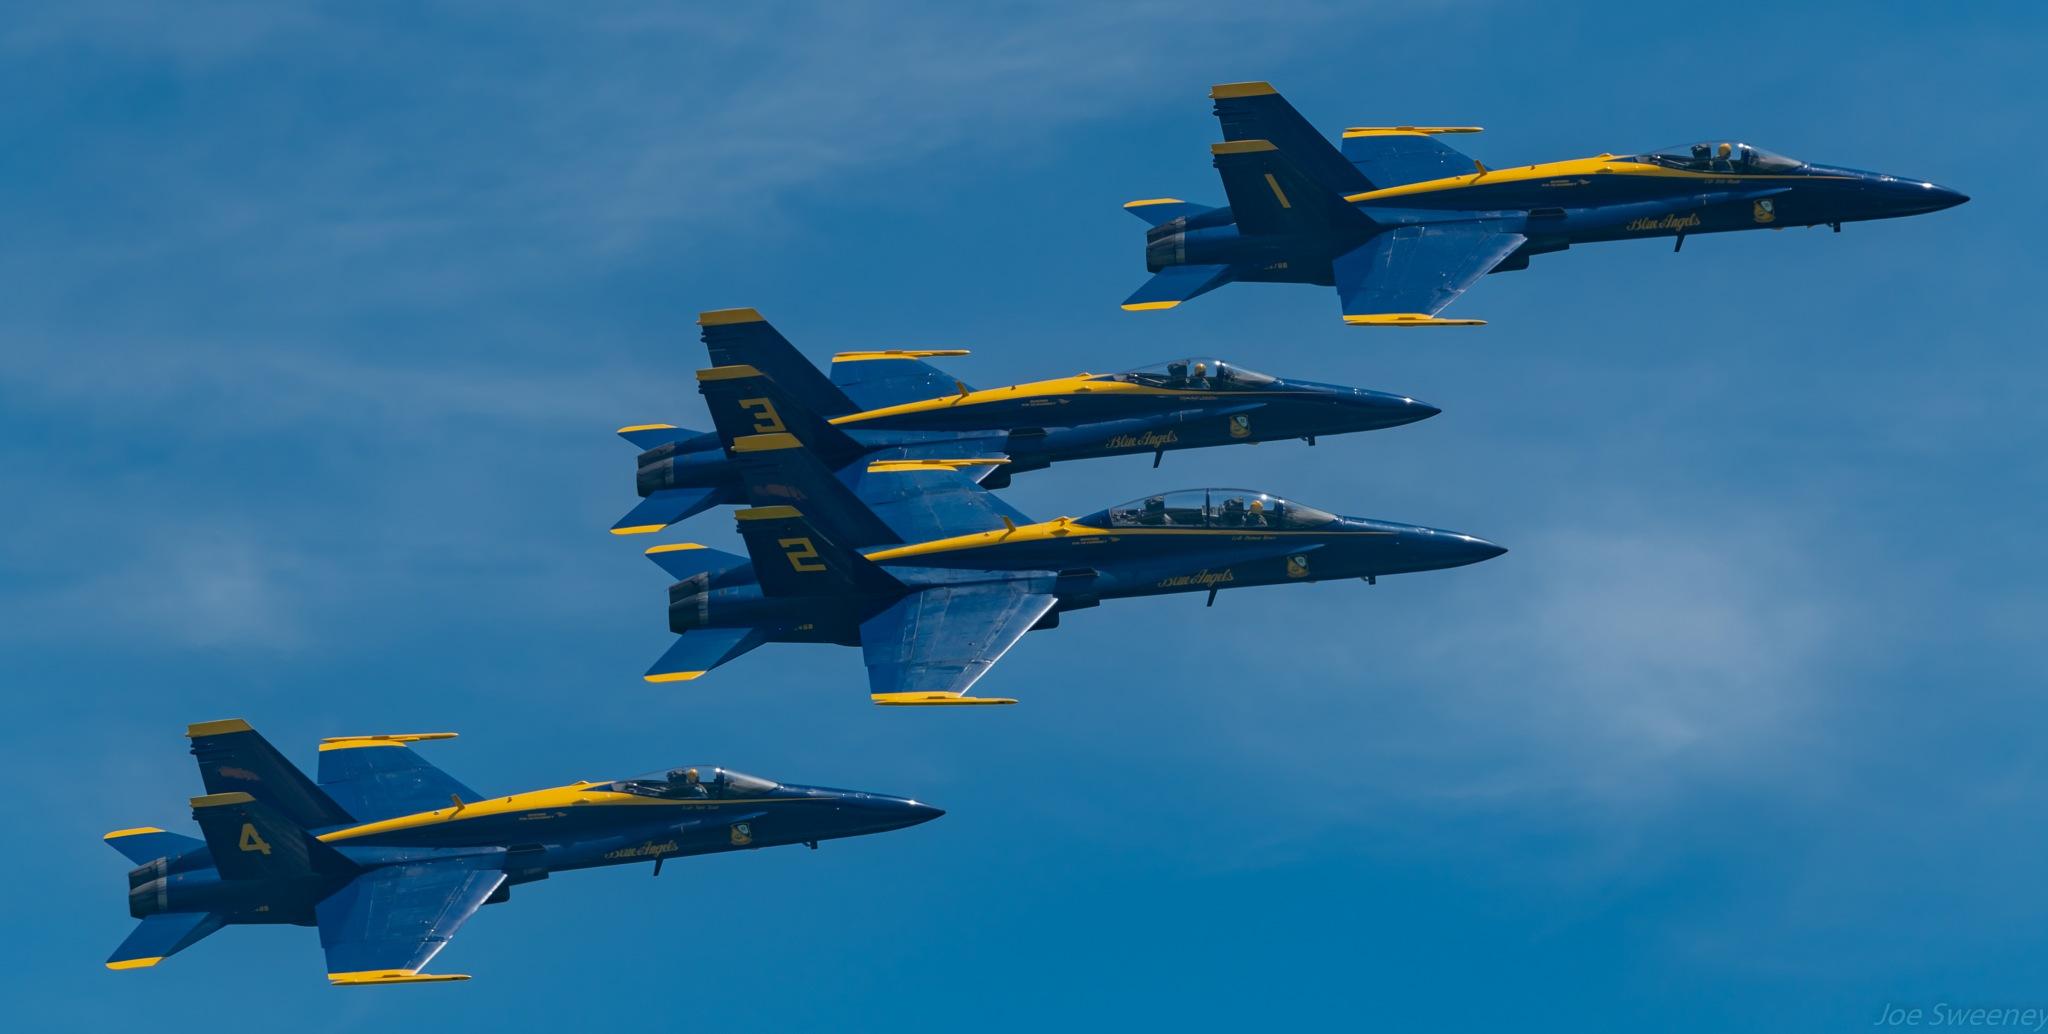 Blue Angels at Pensacola Beach Airshow by Joe Bike